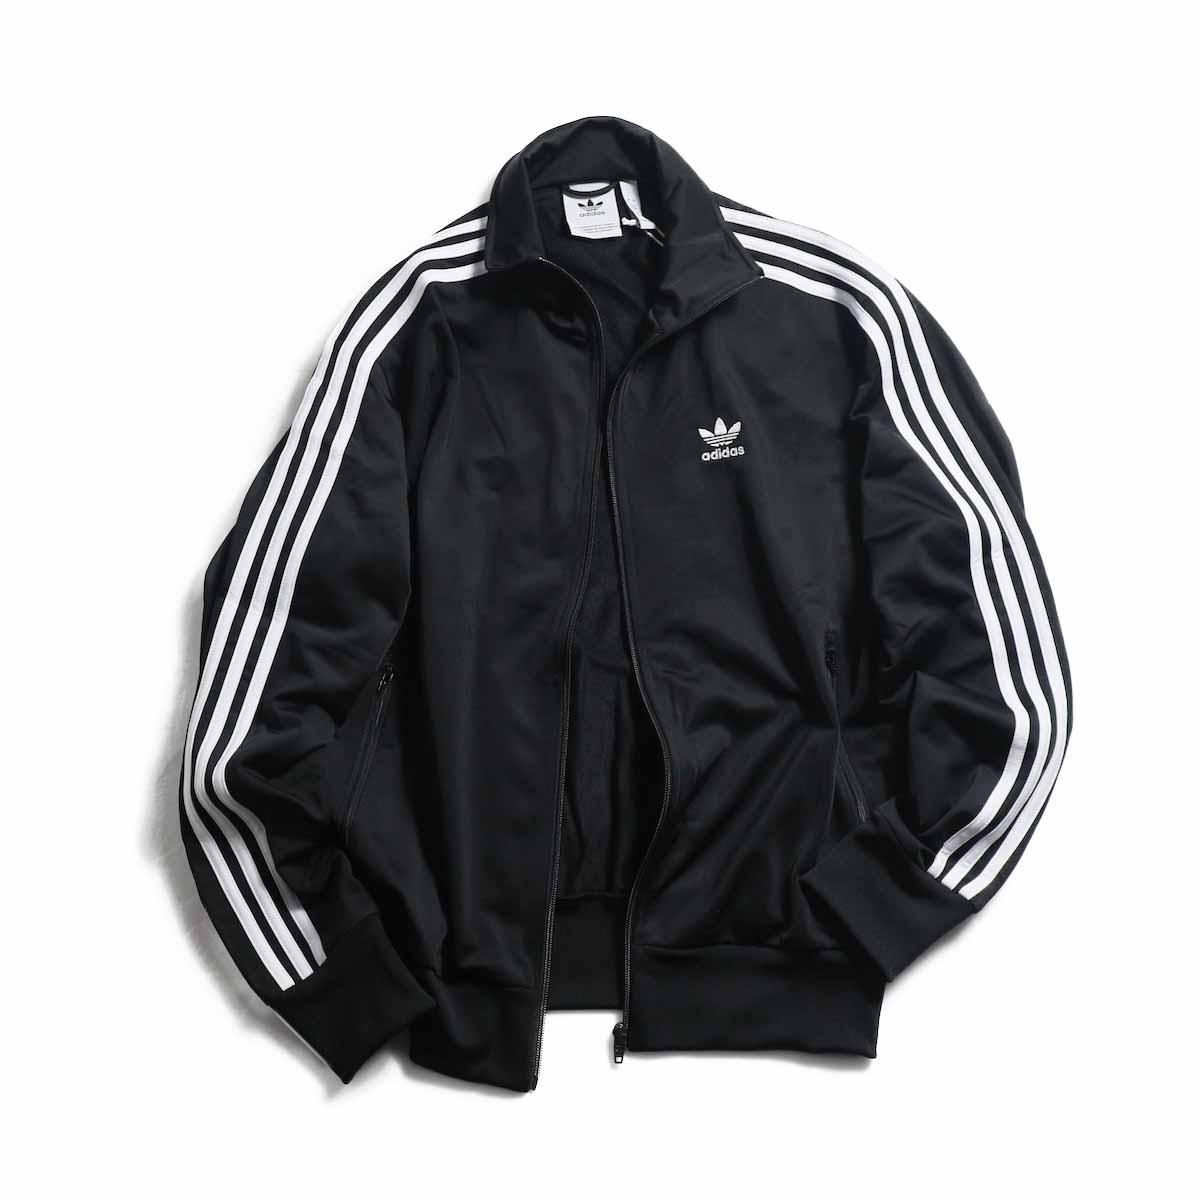 adidas originals / Firebird Track Top -Black